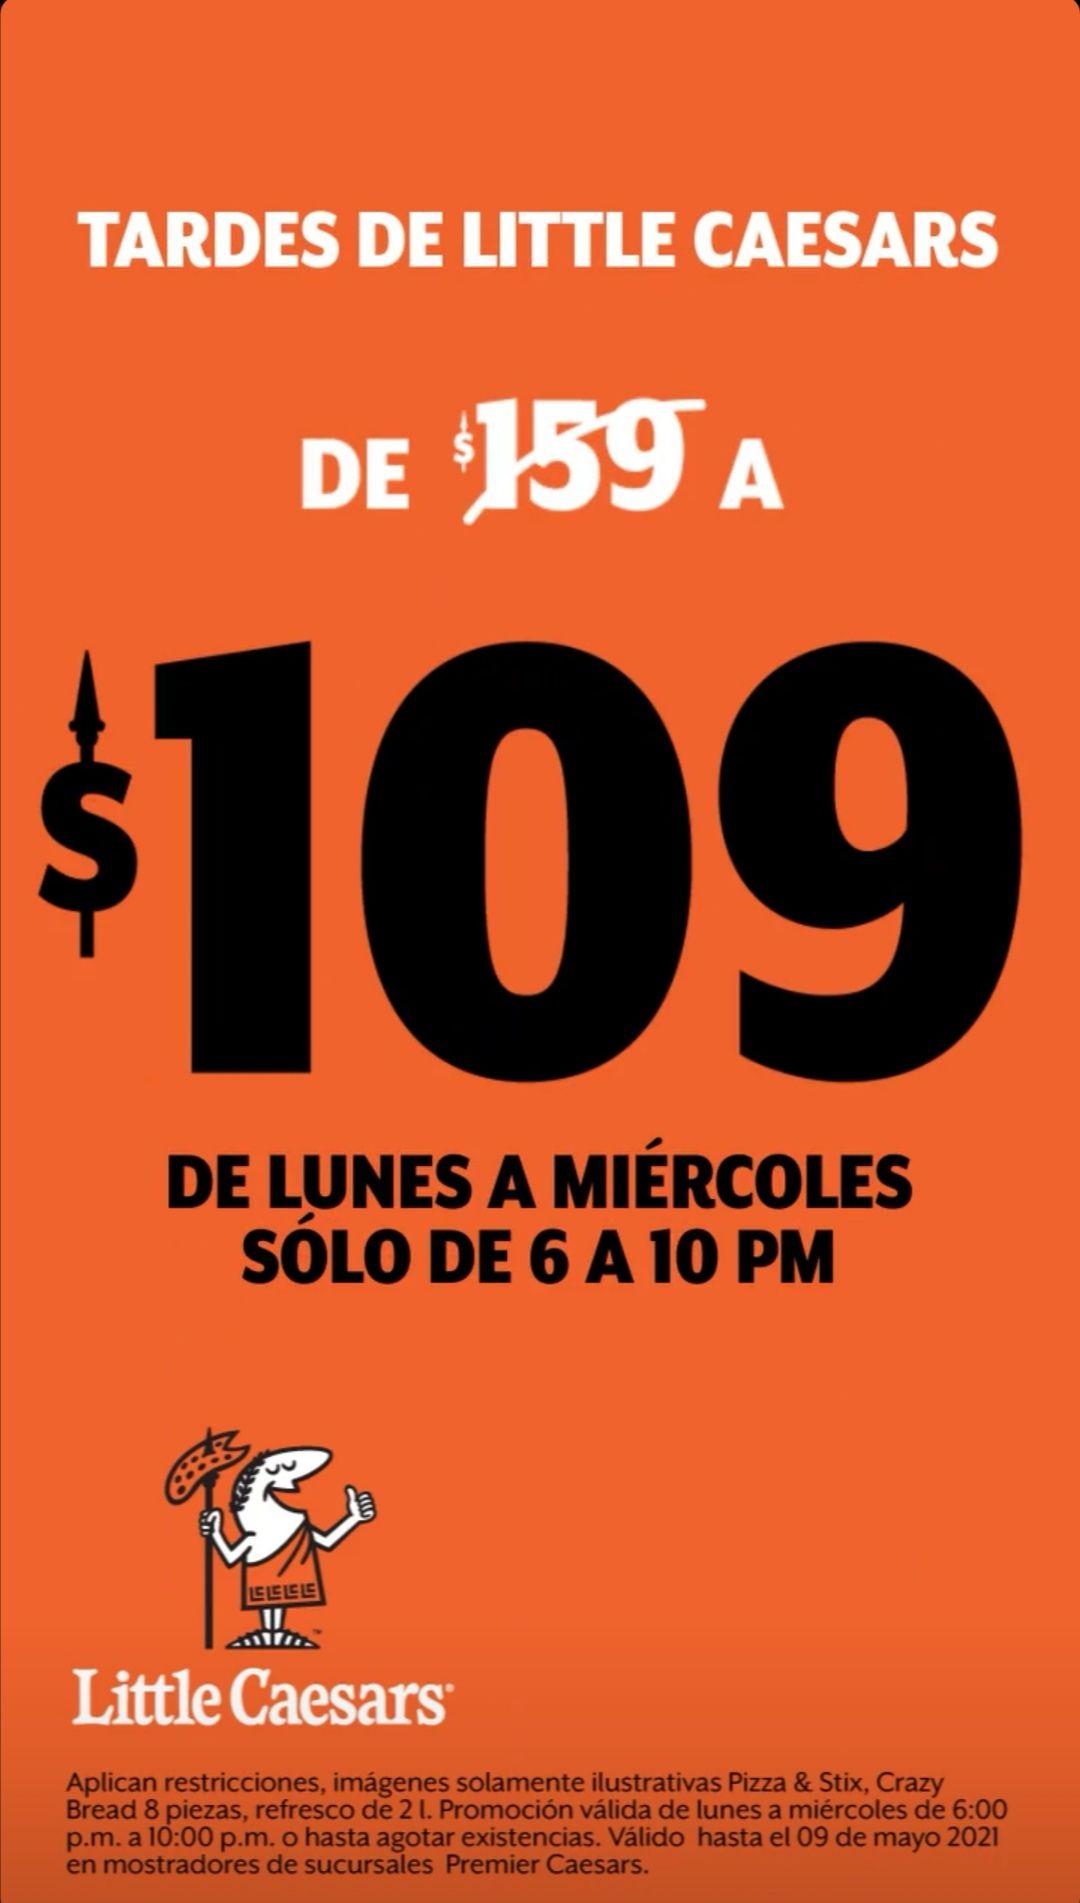 Little Caesars: Tardes de Little Caesars (LUN-MIE 18:00-22:00): Pizza & Stix + Crazy Bread + Refresco Pepsi 2 L $109